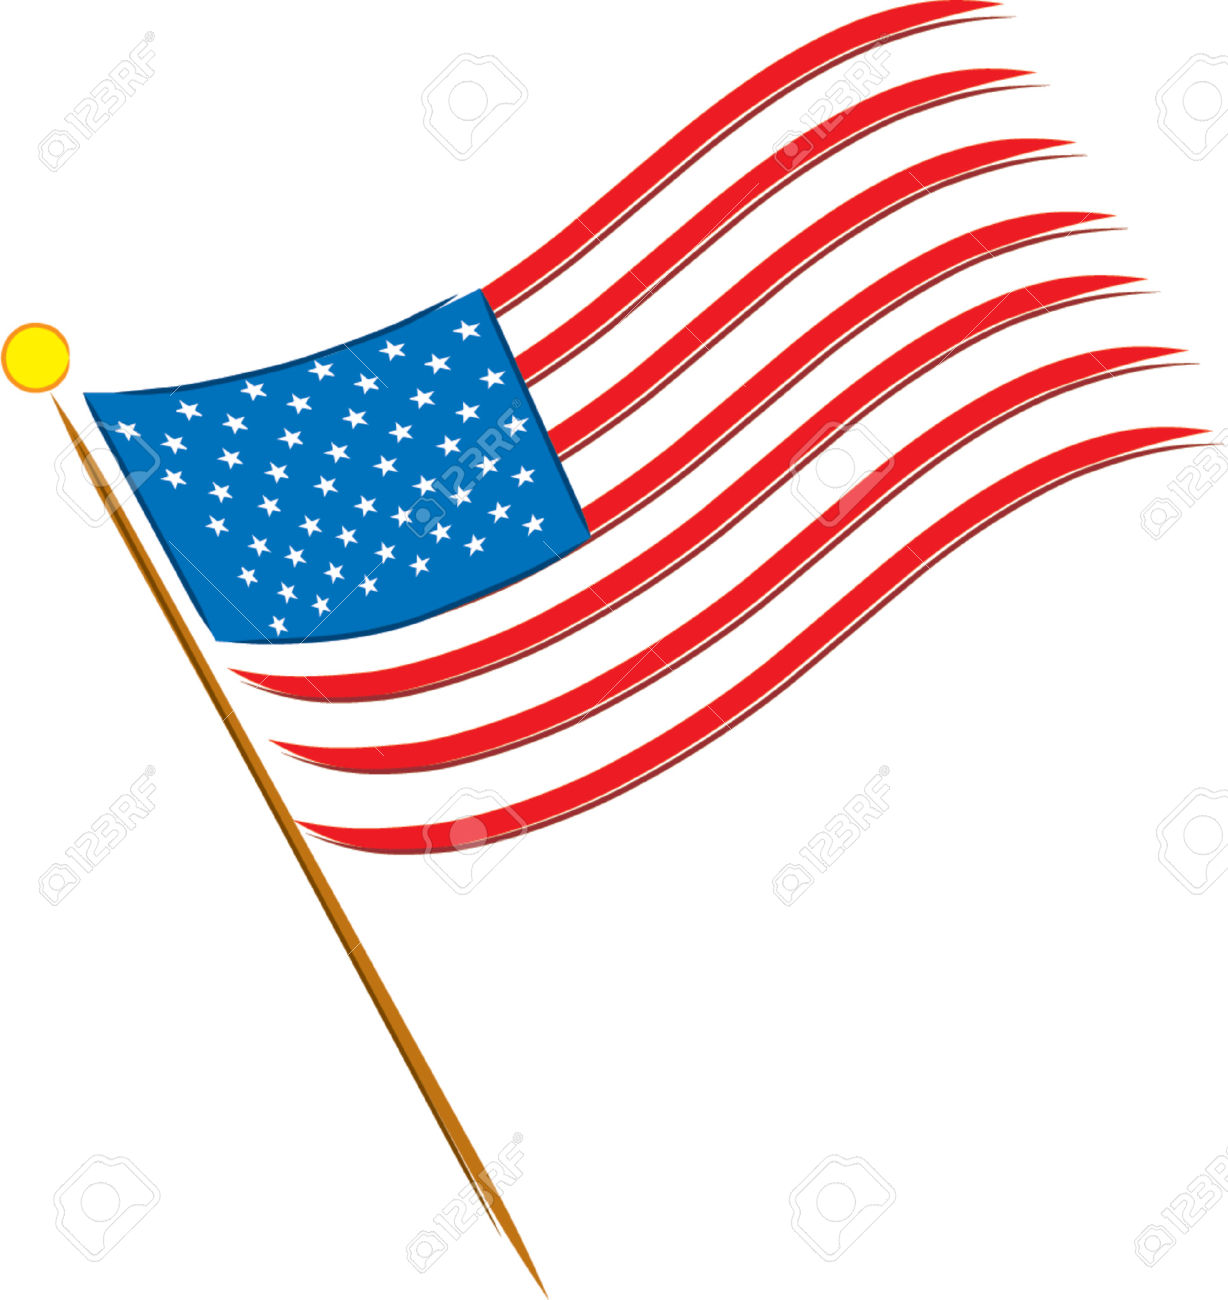 1228x1300 American Flag clipart american star